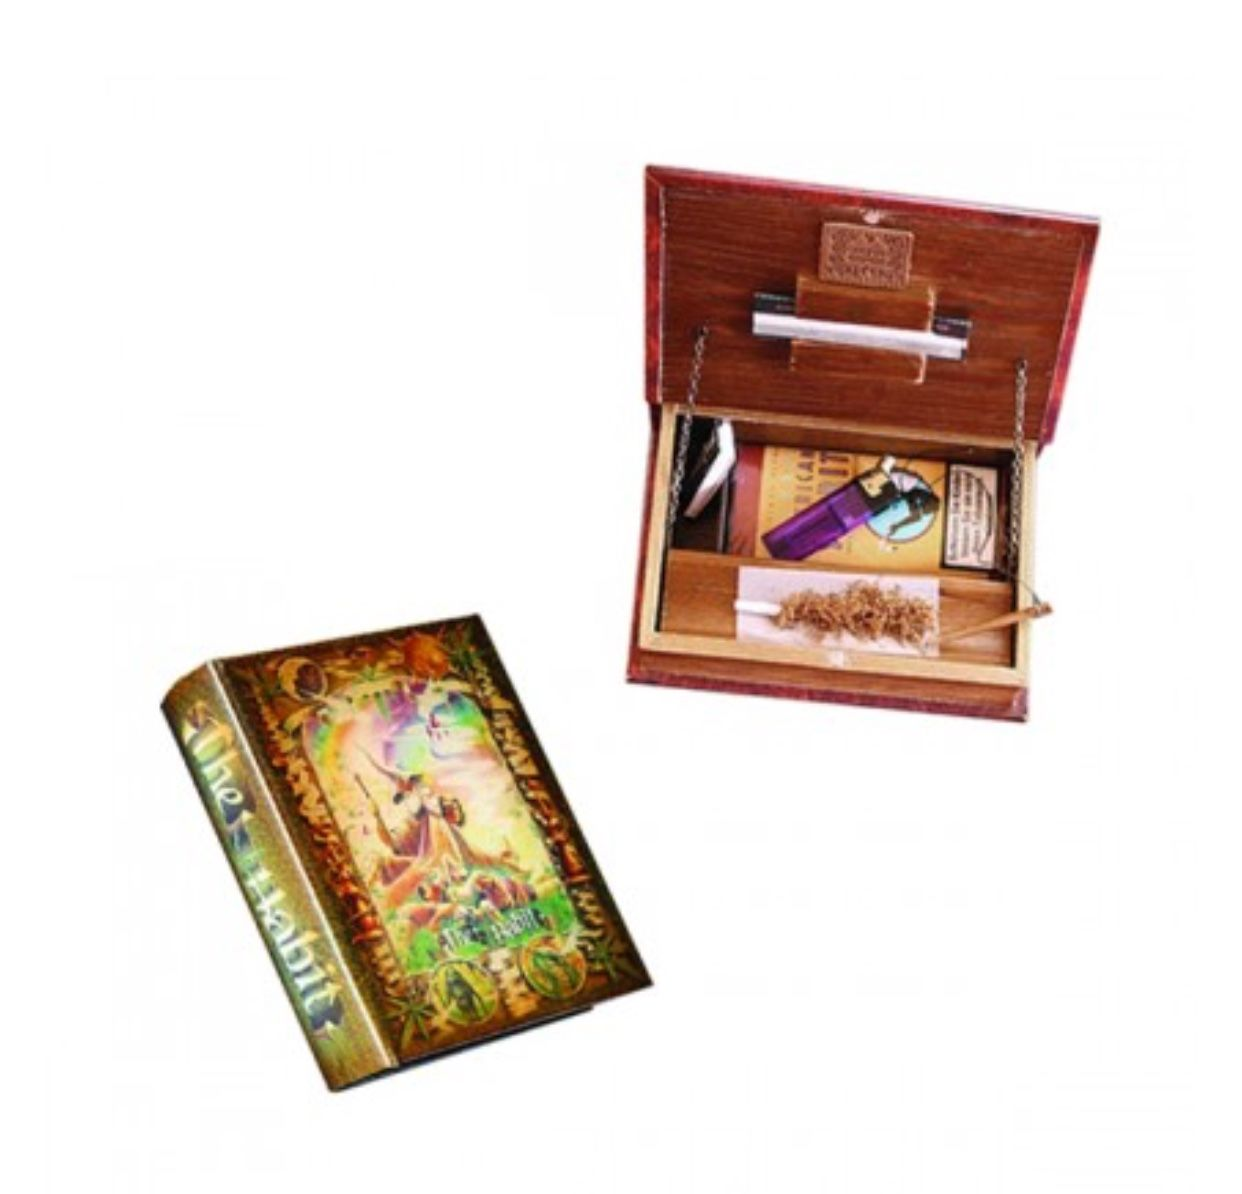 Original Kavatza The Habit Roll Book and Stealth Stash